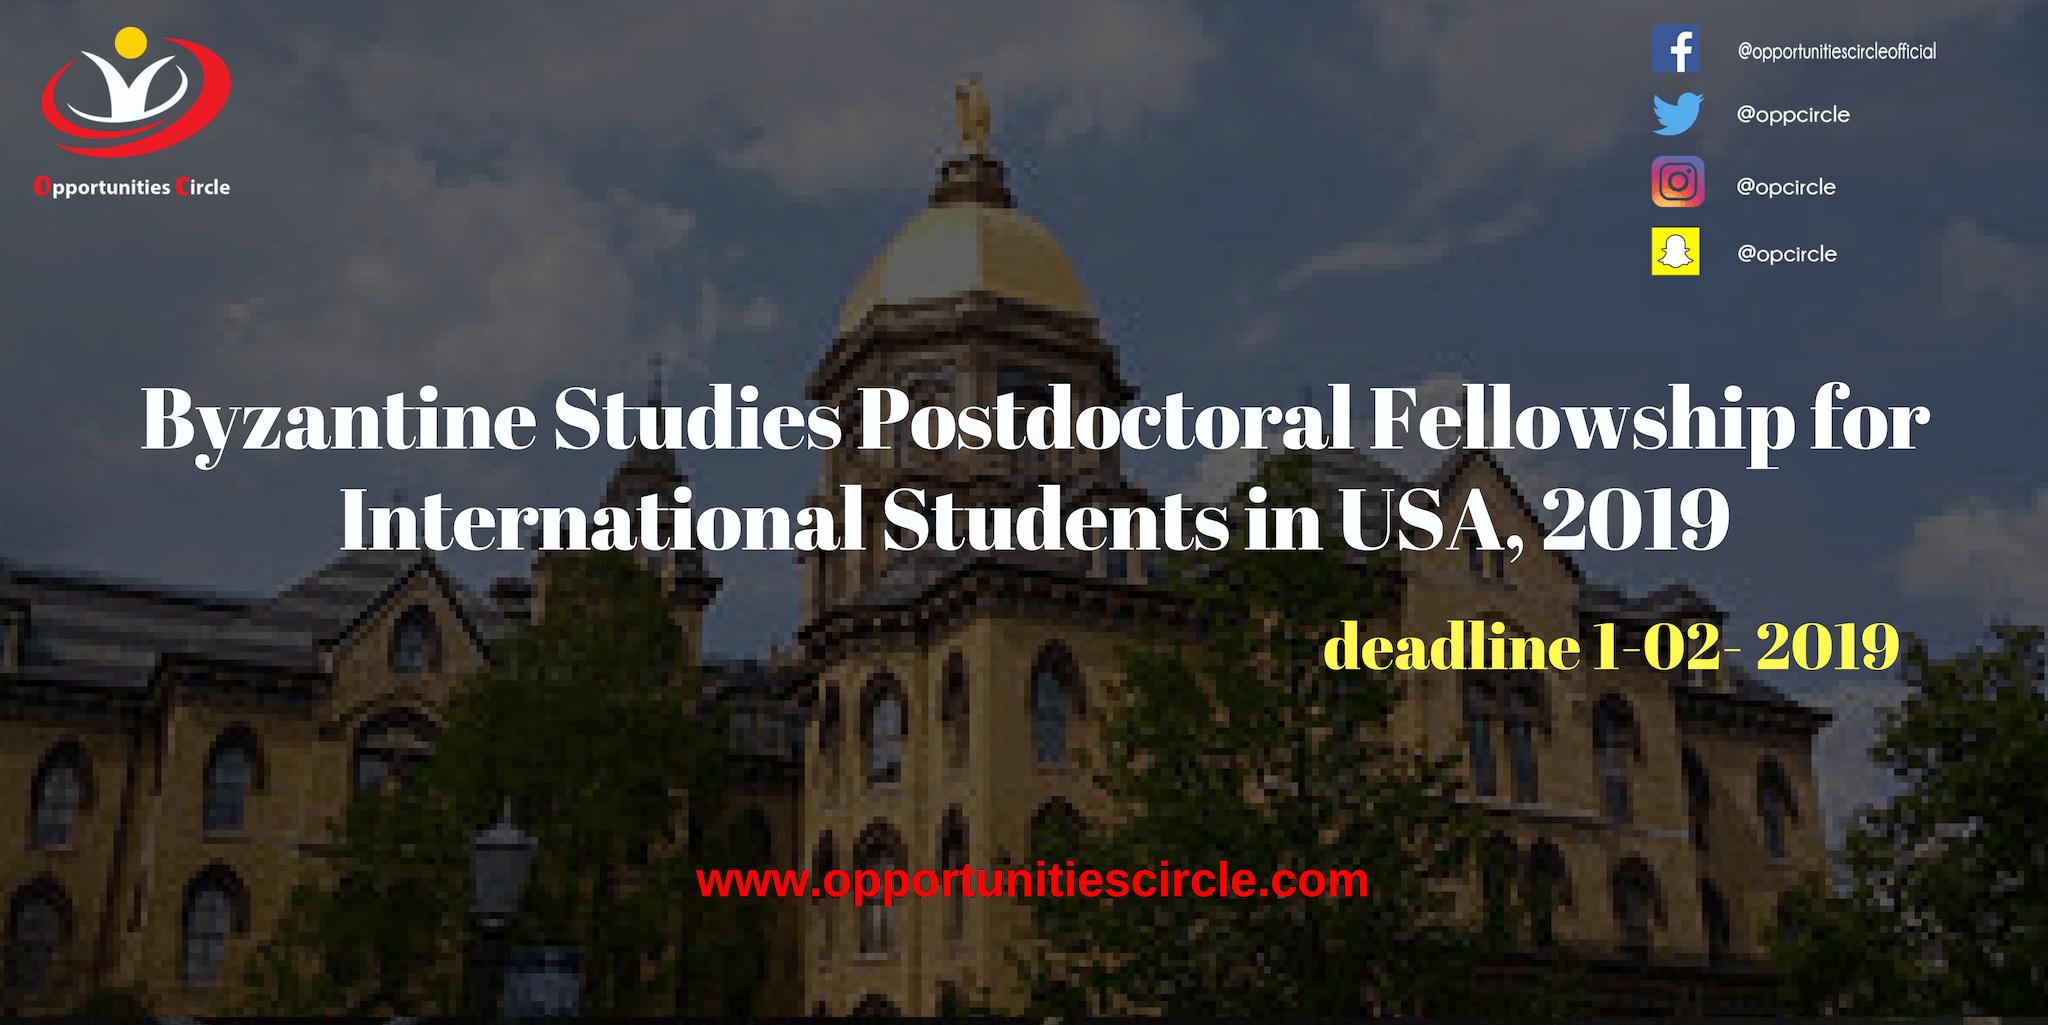 Byzantine Studies Postdoctoral Fellowship for International